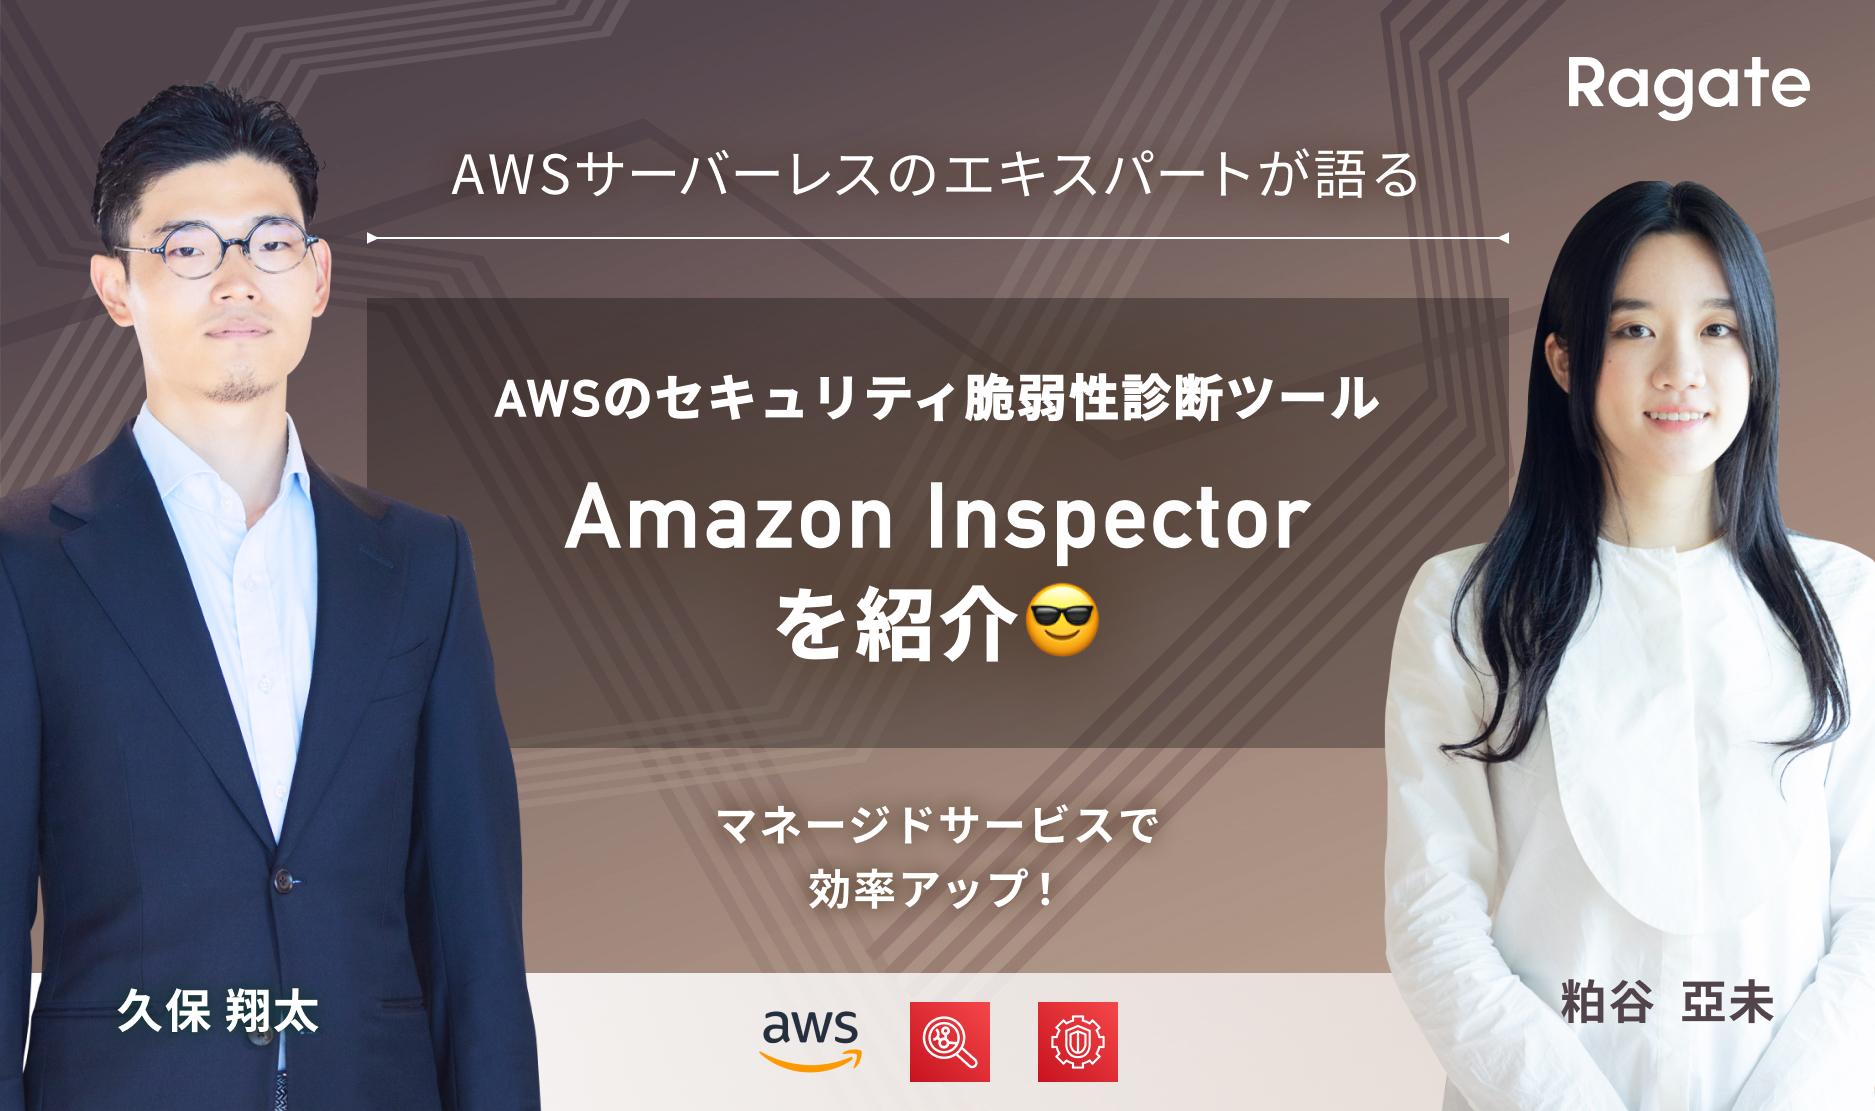 AWSのセキュリティ脆弱性診断ツールAmazon Inspectorを紹介😎マネージドサービスで効率アップ!